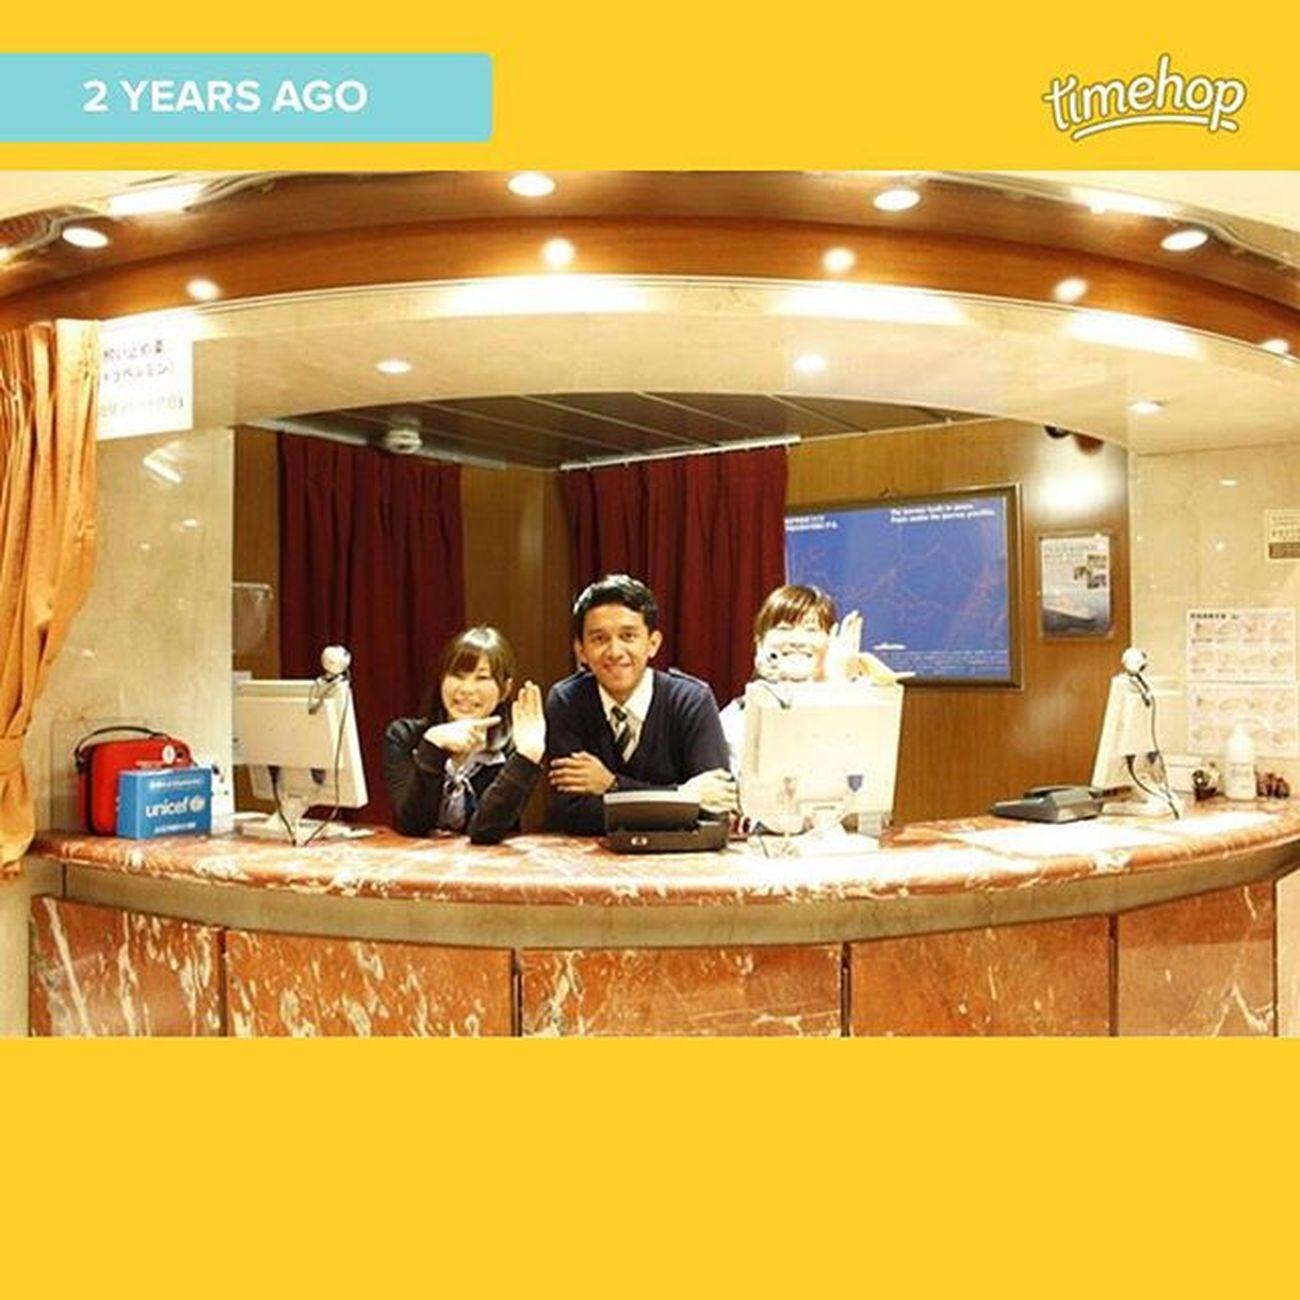 Moments Throwback 2yrs Peaceboat Frontliner Japan Like4like Aroundtheworld Miss Maamu Kubochan